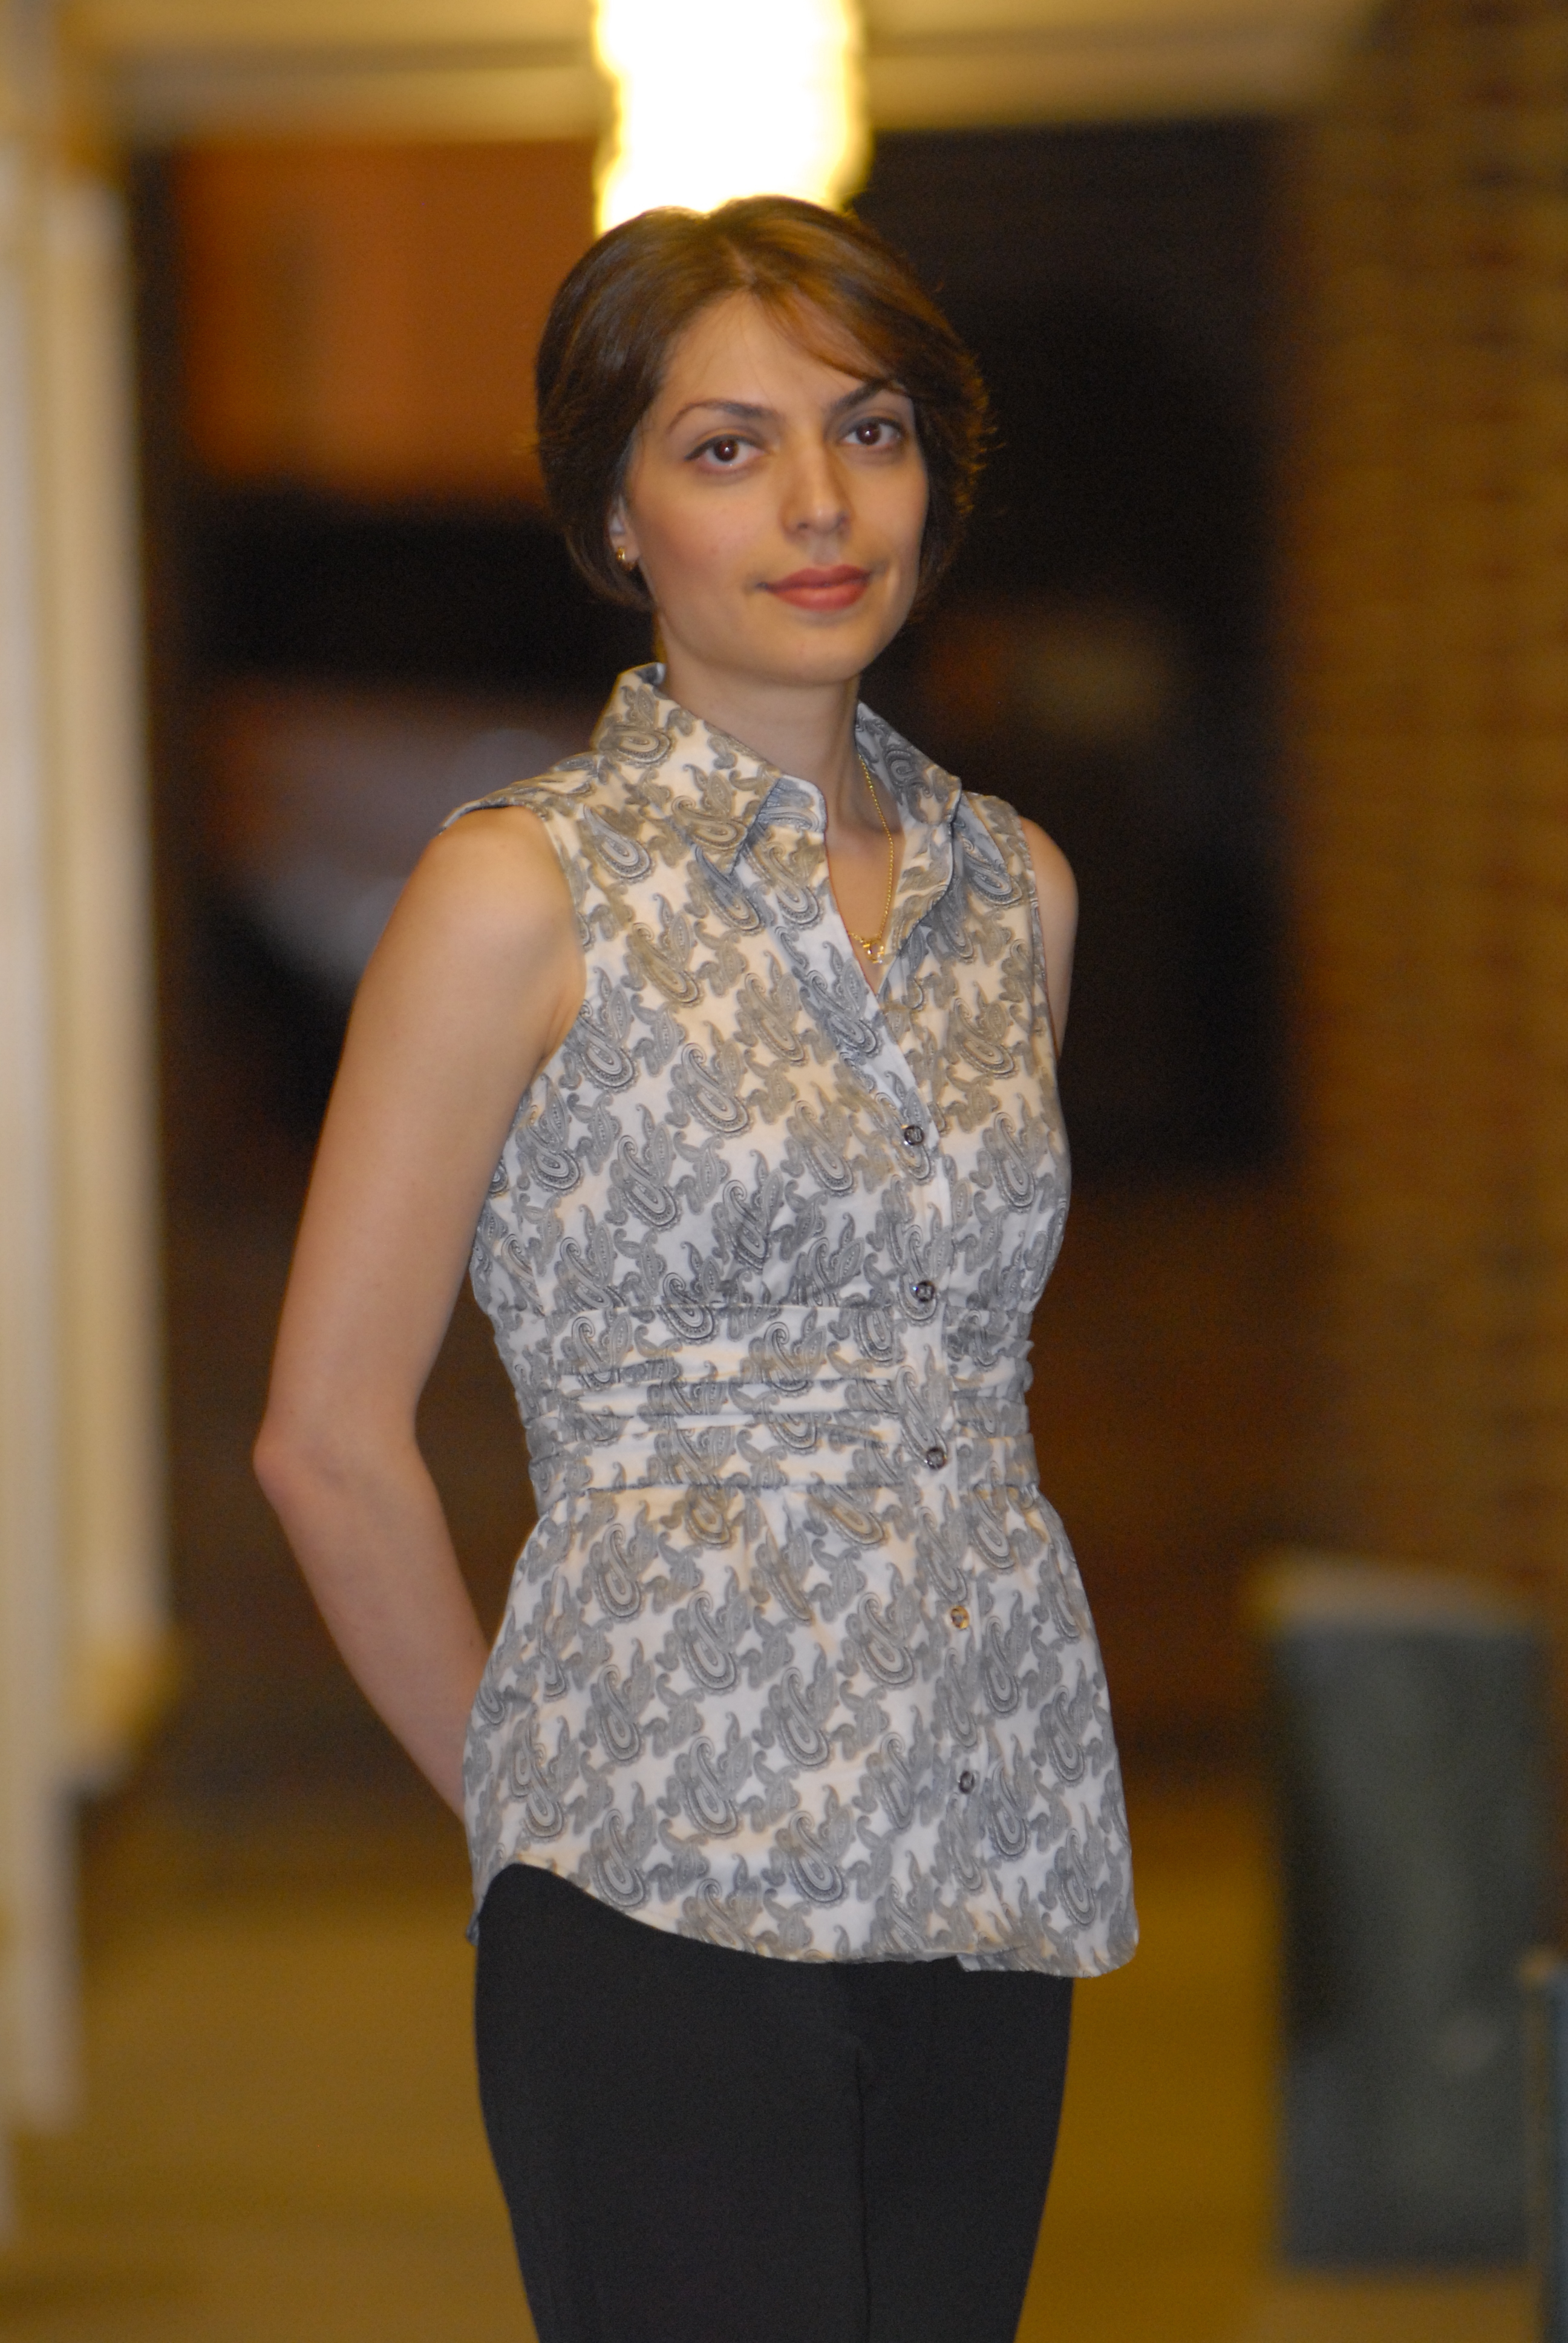 Composer Parisa Sabet